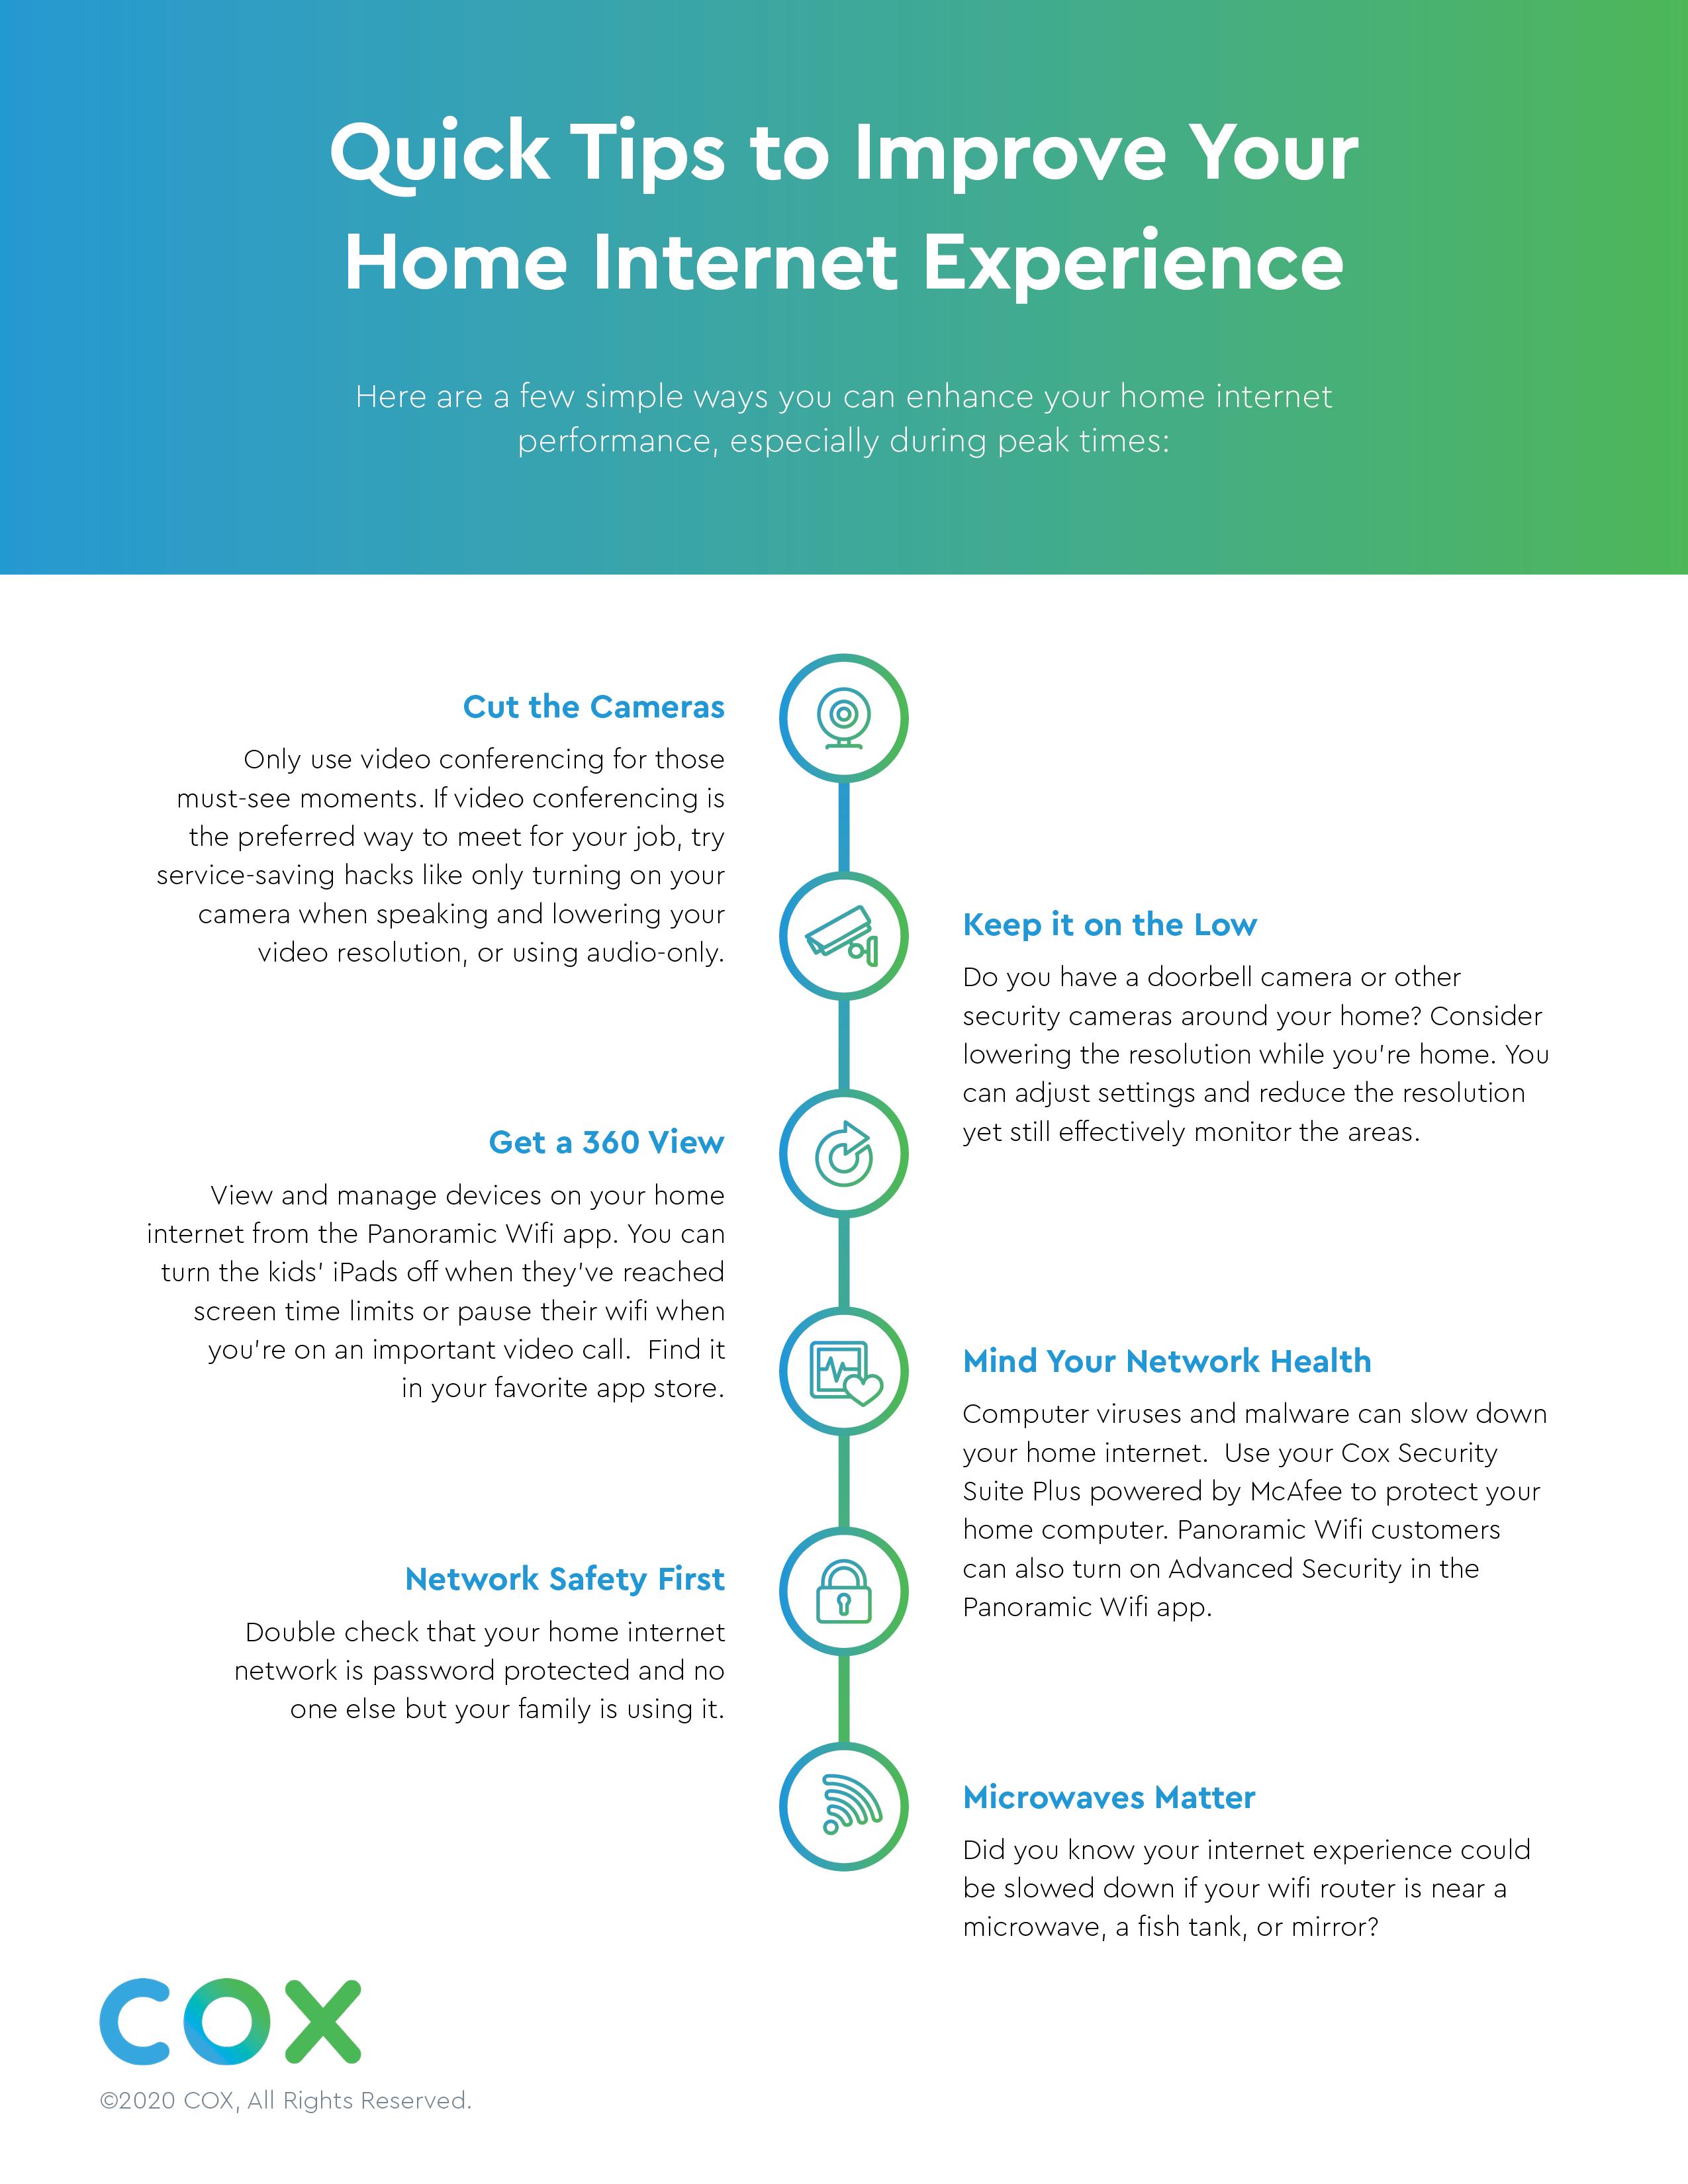 Cox Internet Tips Infographic